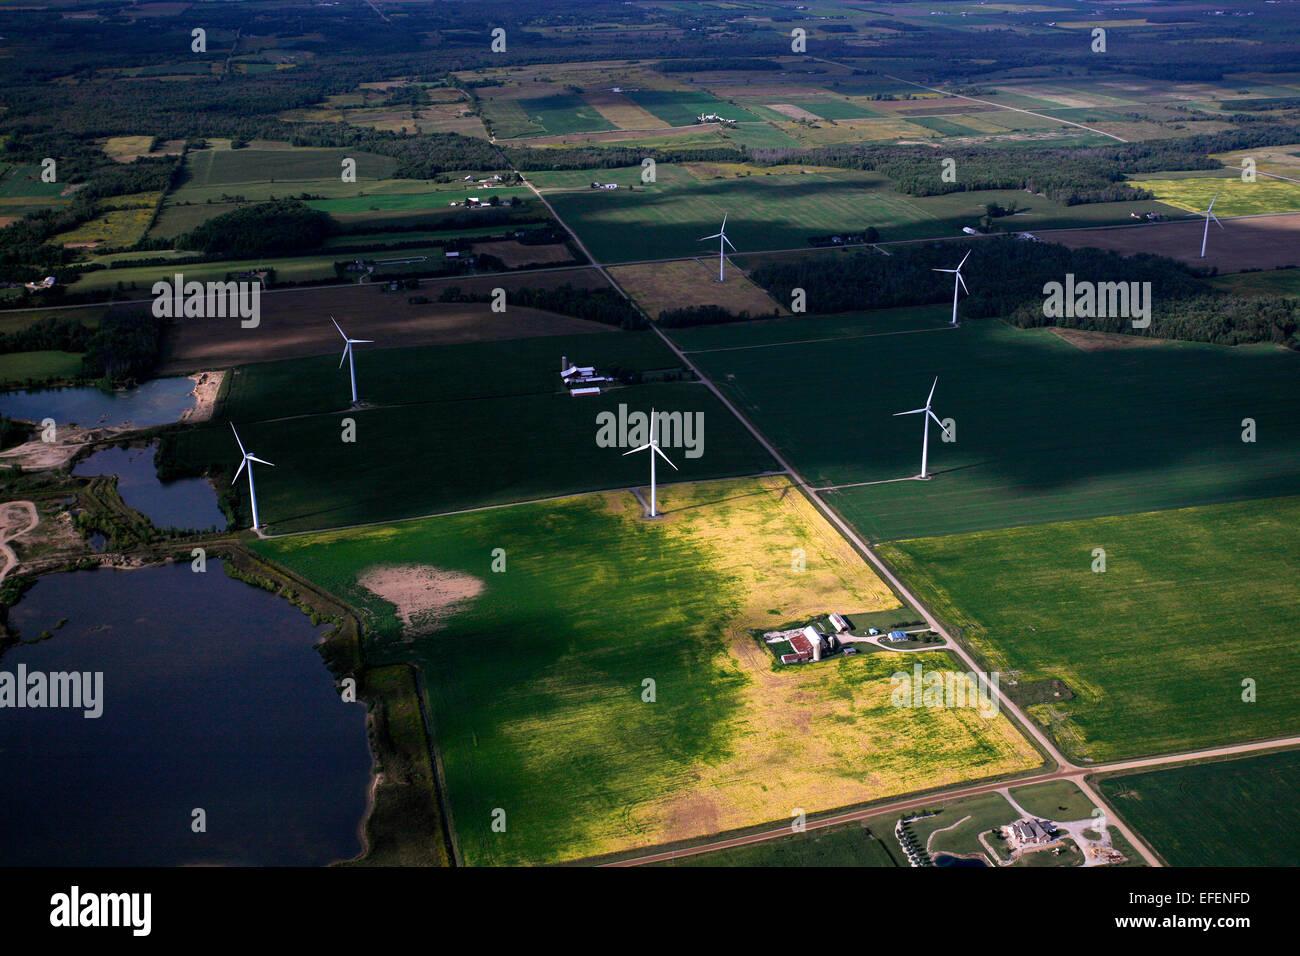 Wind turbines amongst farmland in the Saginaw Bay area. - Stock Image